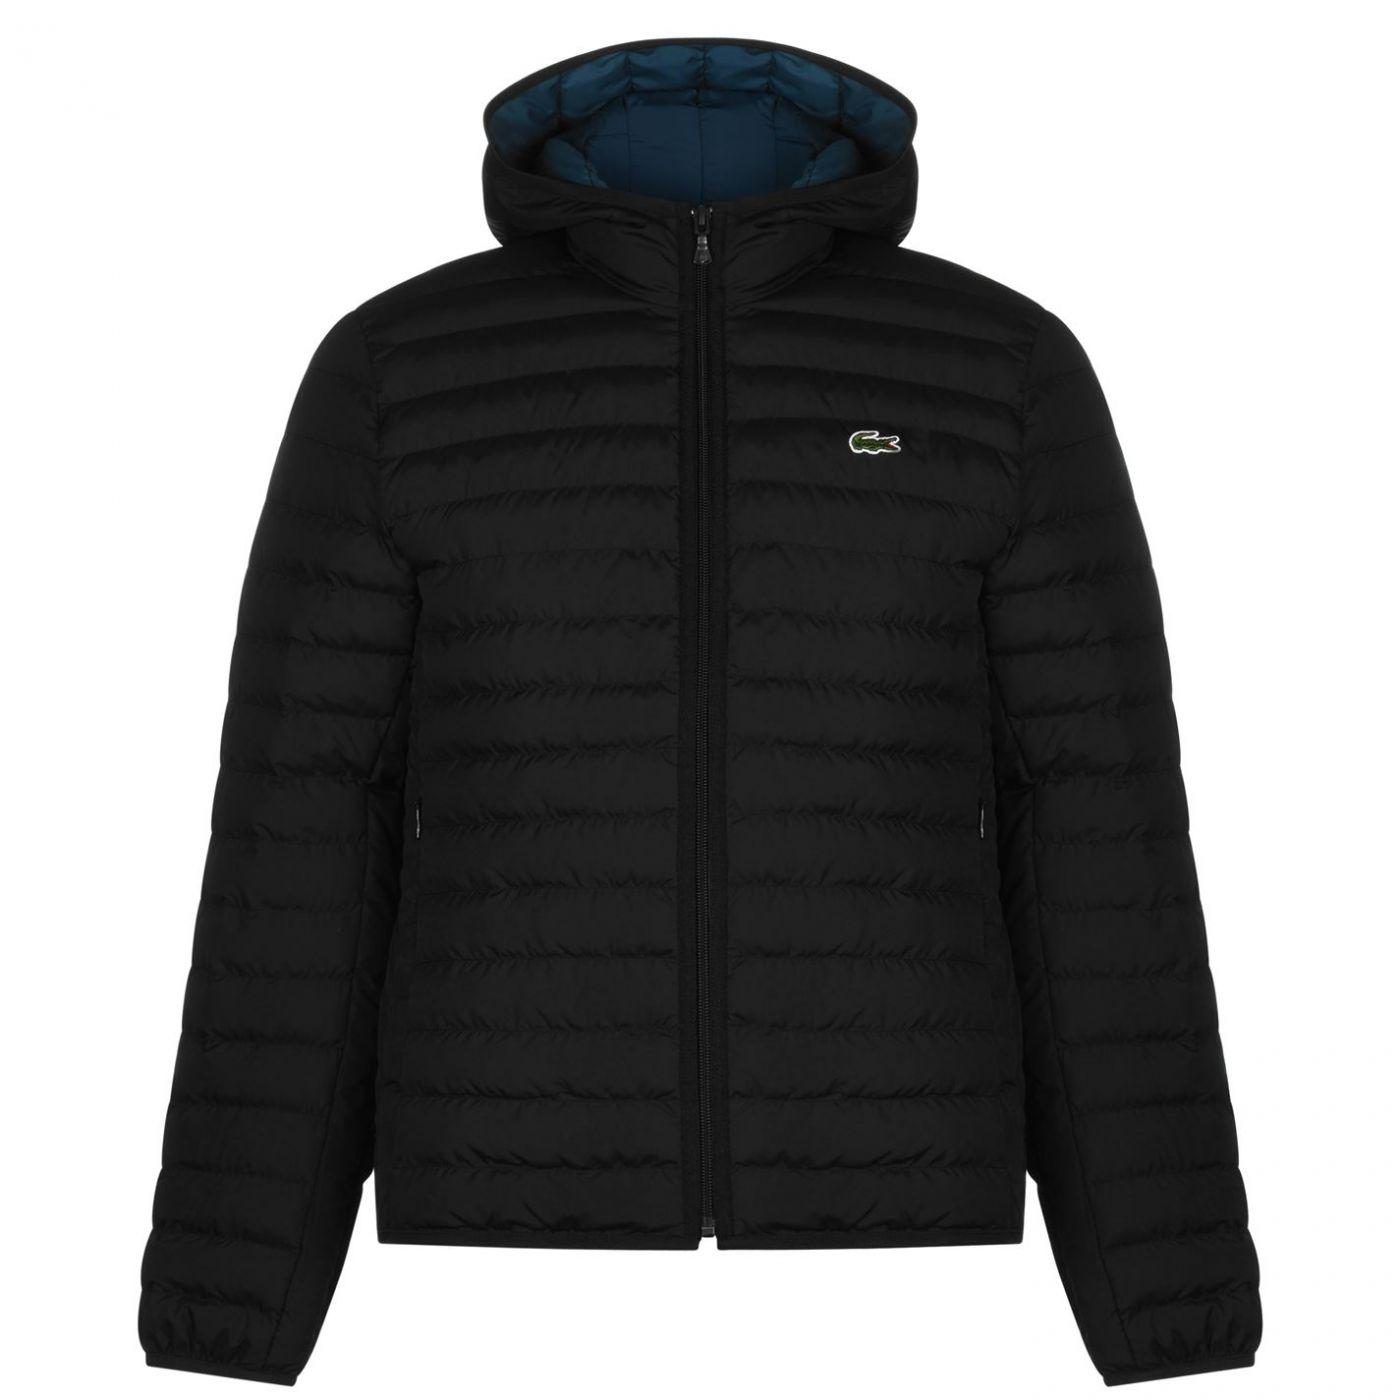 Lacoste Micro Bubble Jacket